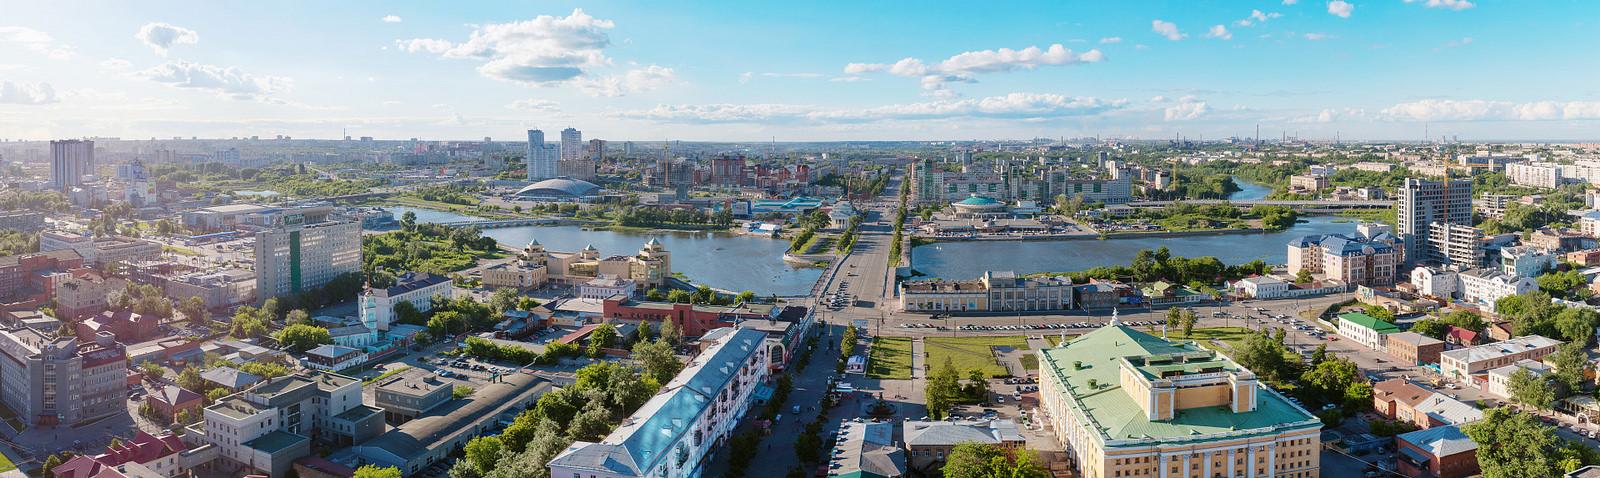 chelyabinsk_pogoda_03